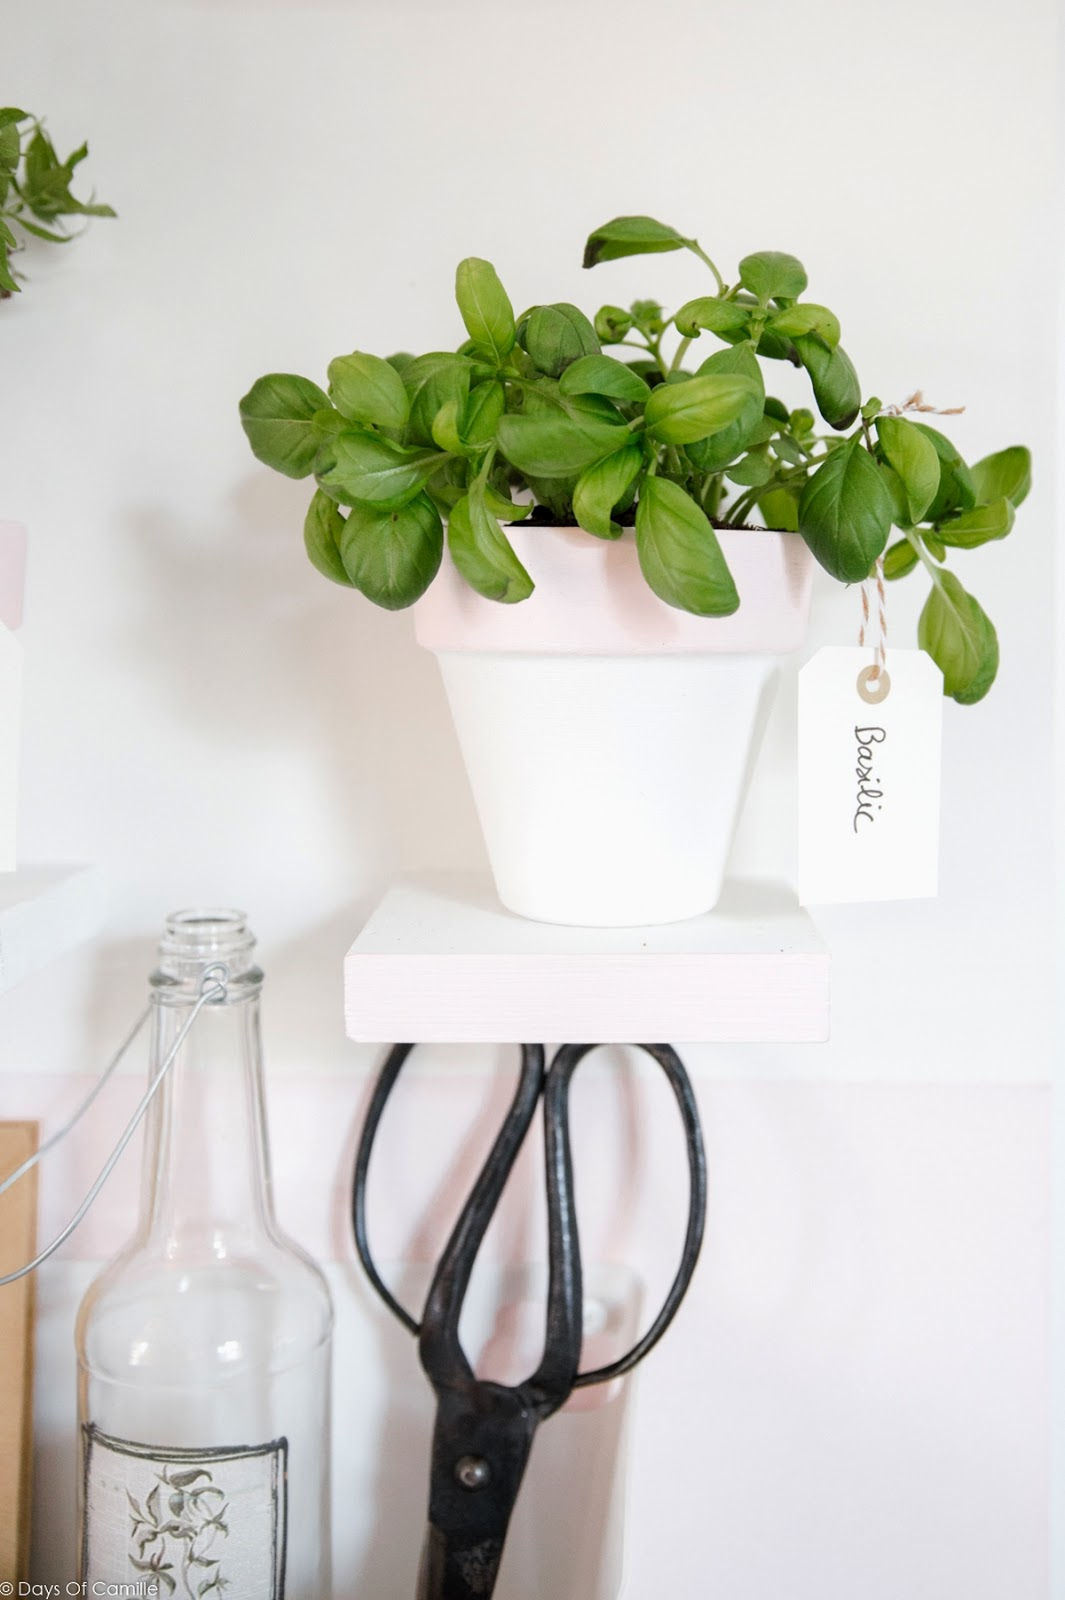 Make it - Tableau pour plantes aromatiques   Days Of Camille x Leroy Merlin